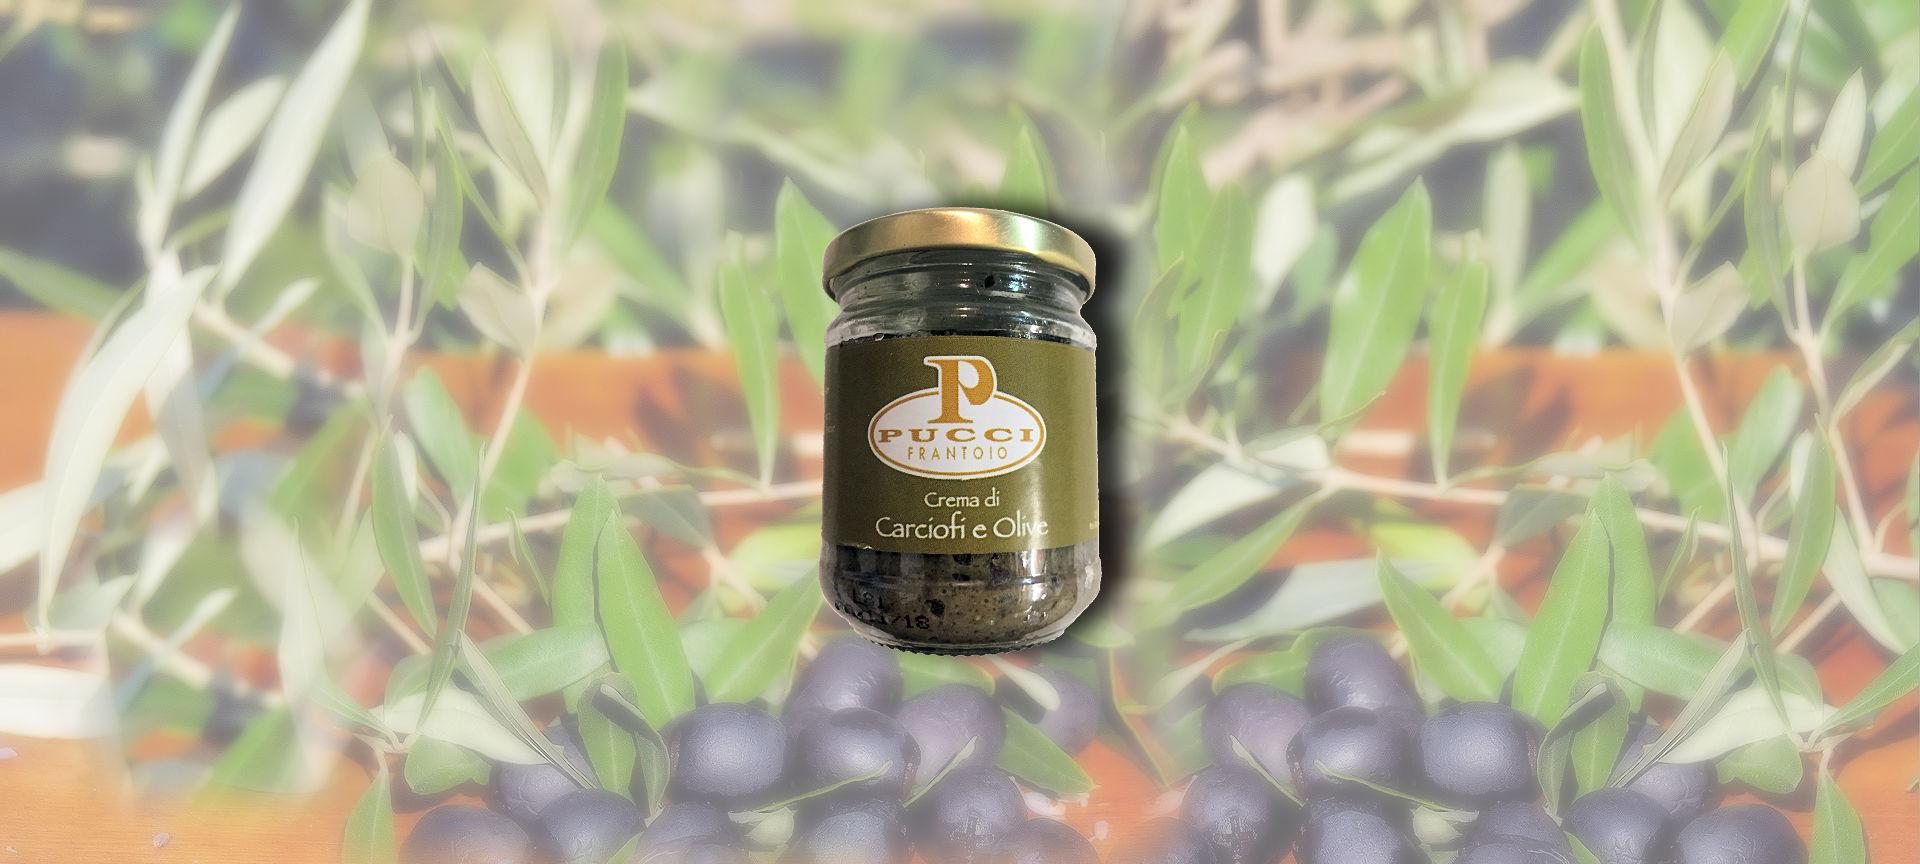 Crema di Carciofi e Olive